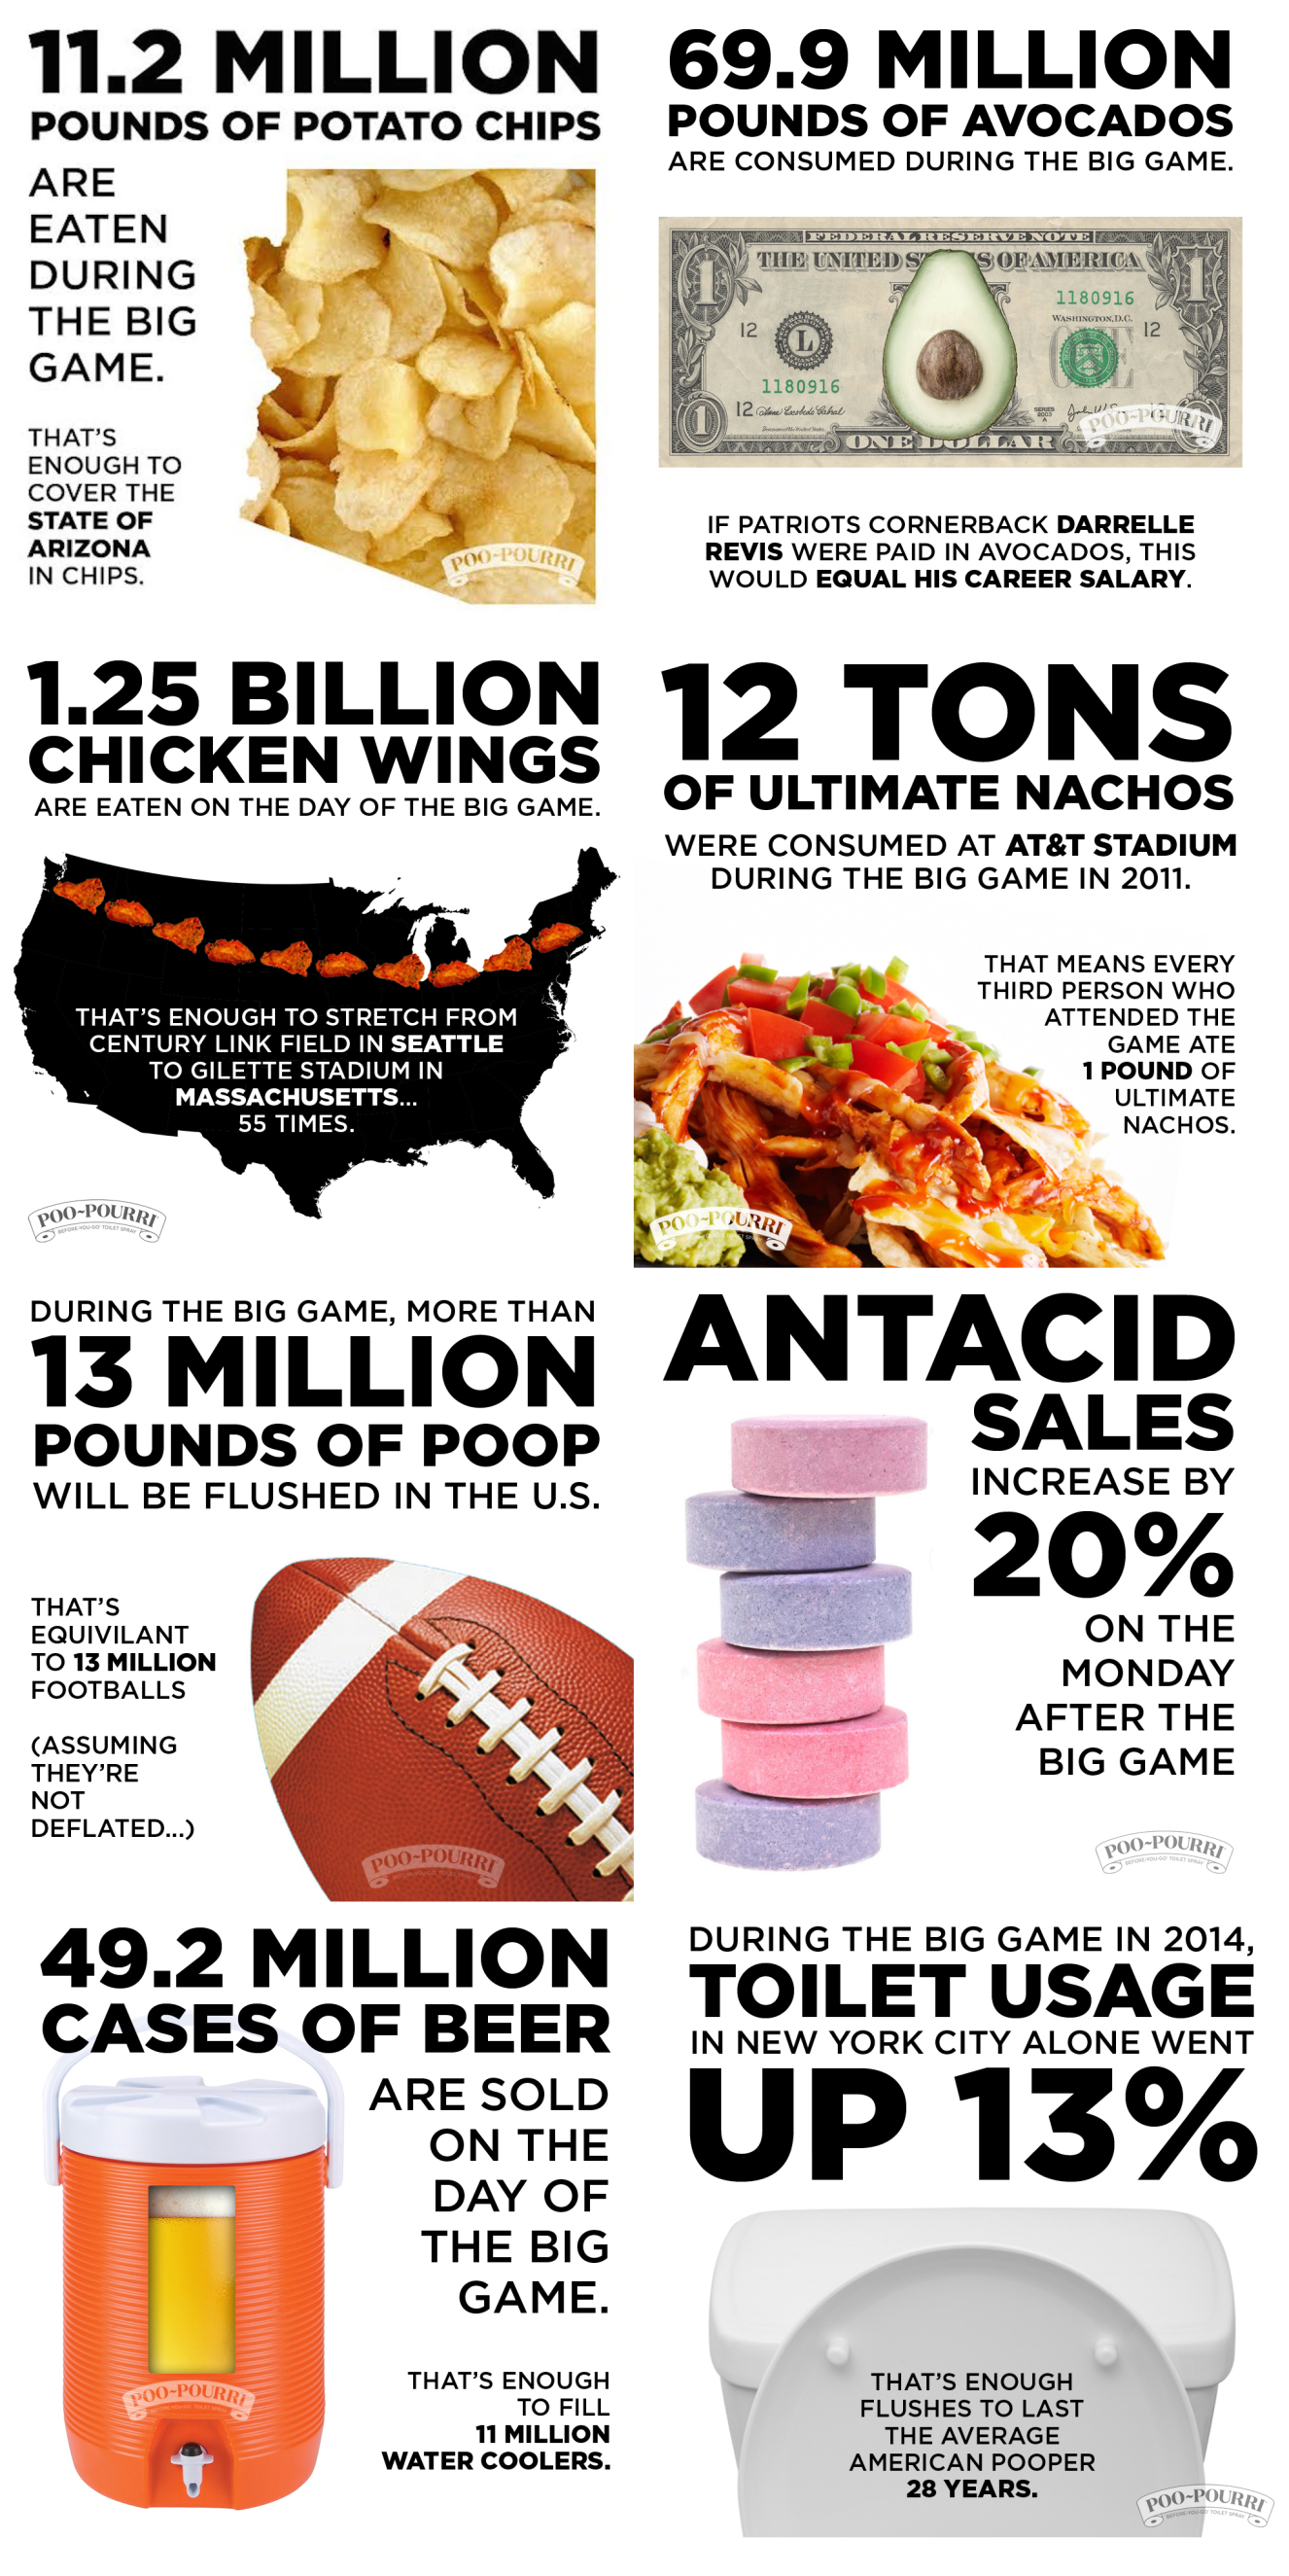 Gluten Free party food,celiac disease,bite sized celiac,gluten free,chicago gluten free,celiac blog, celiac news